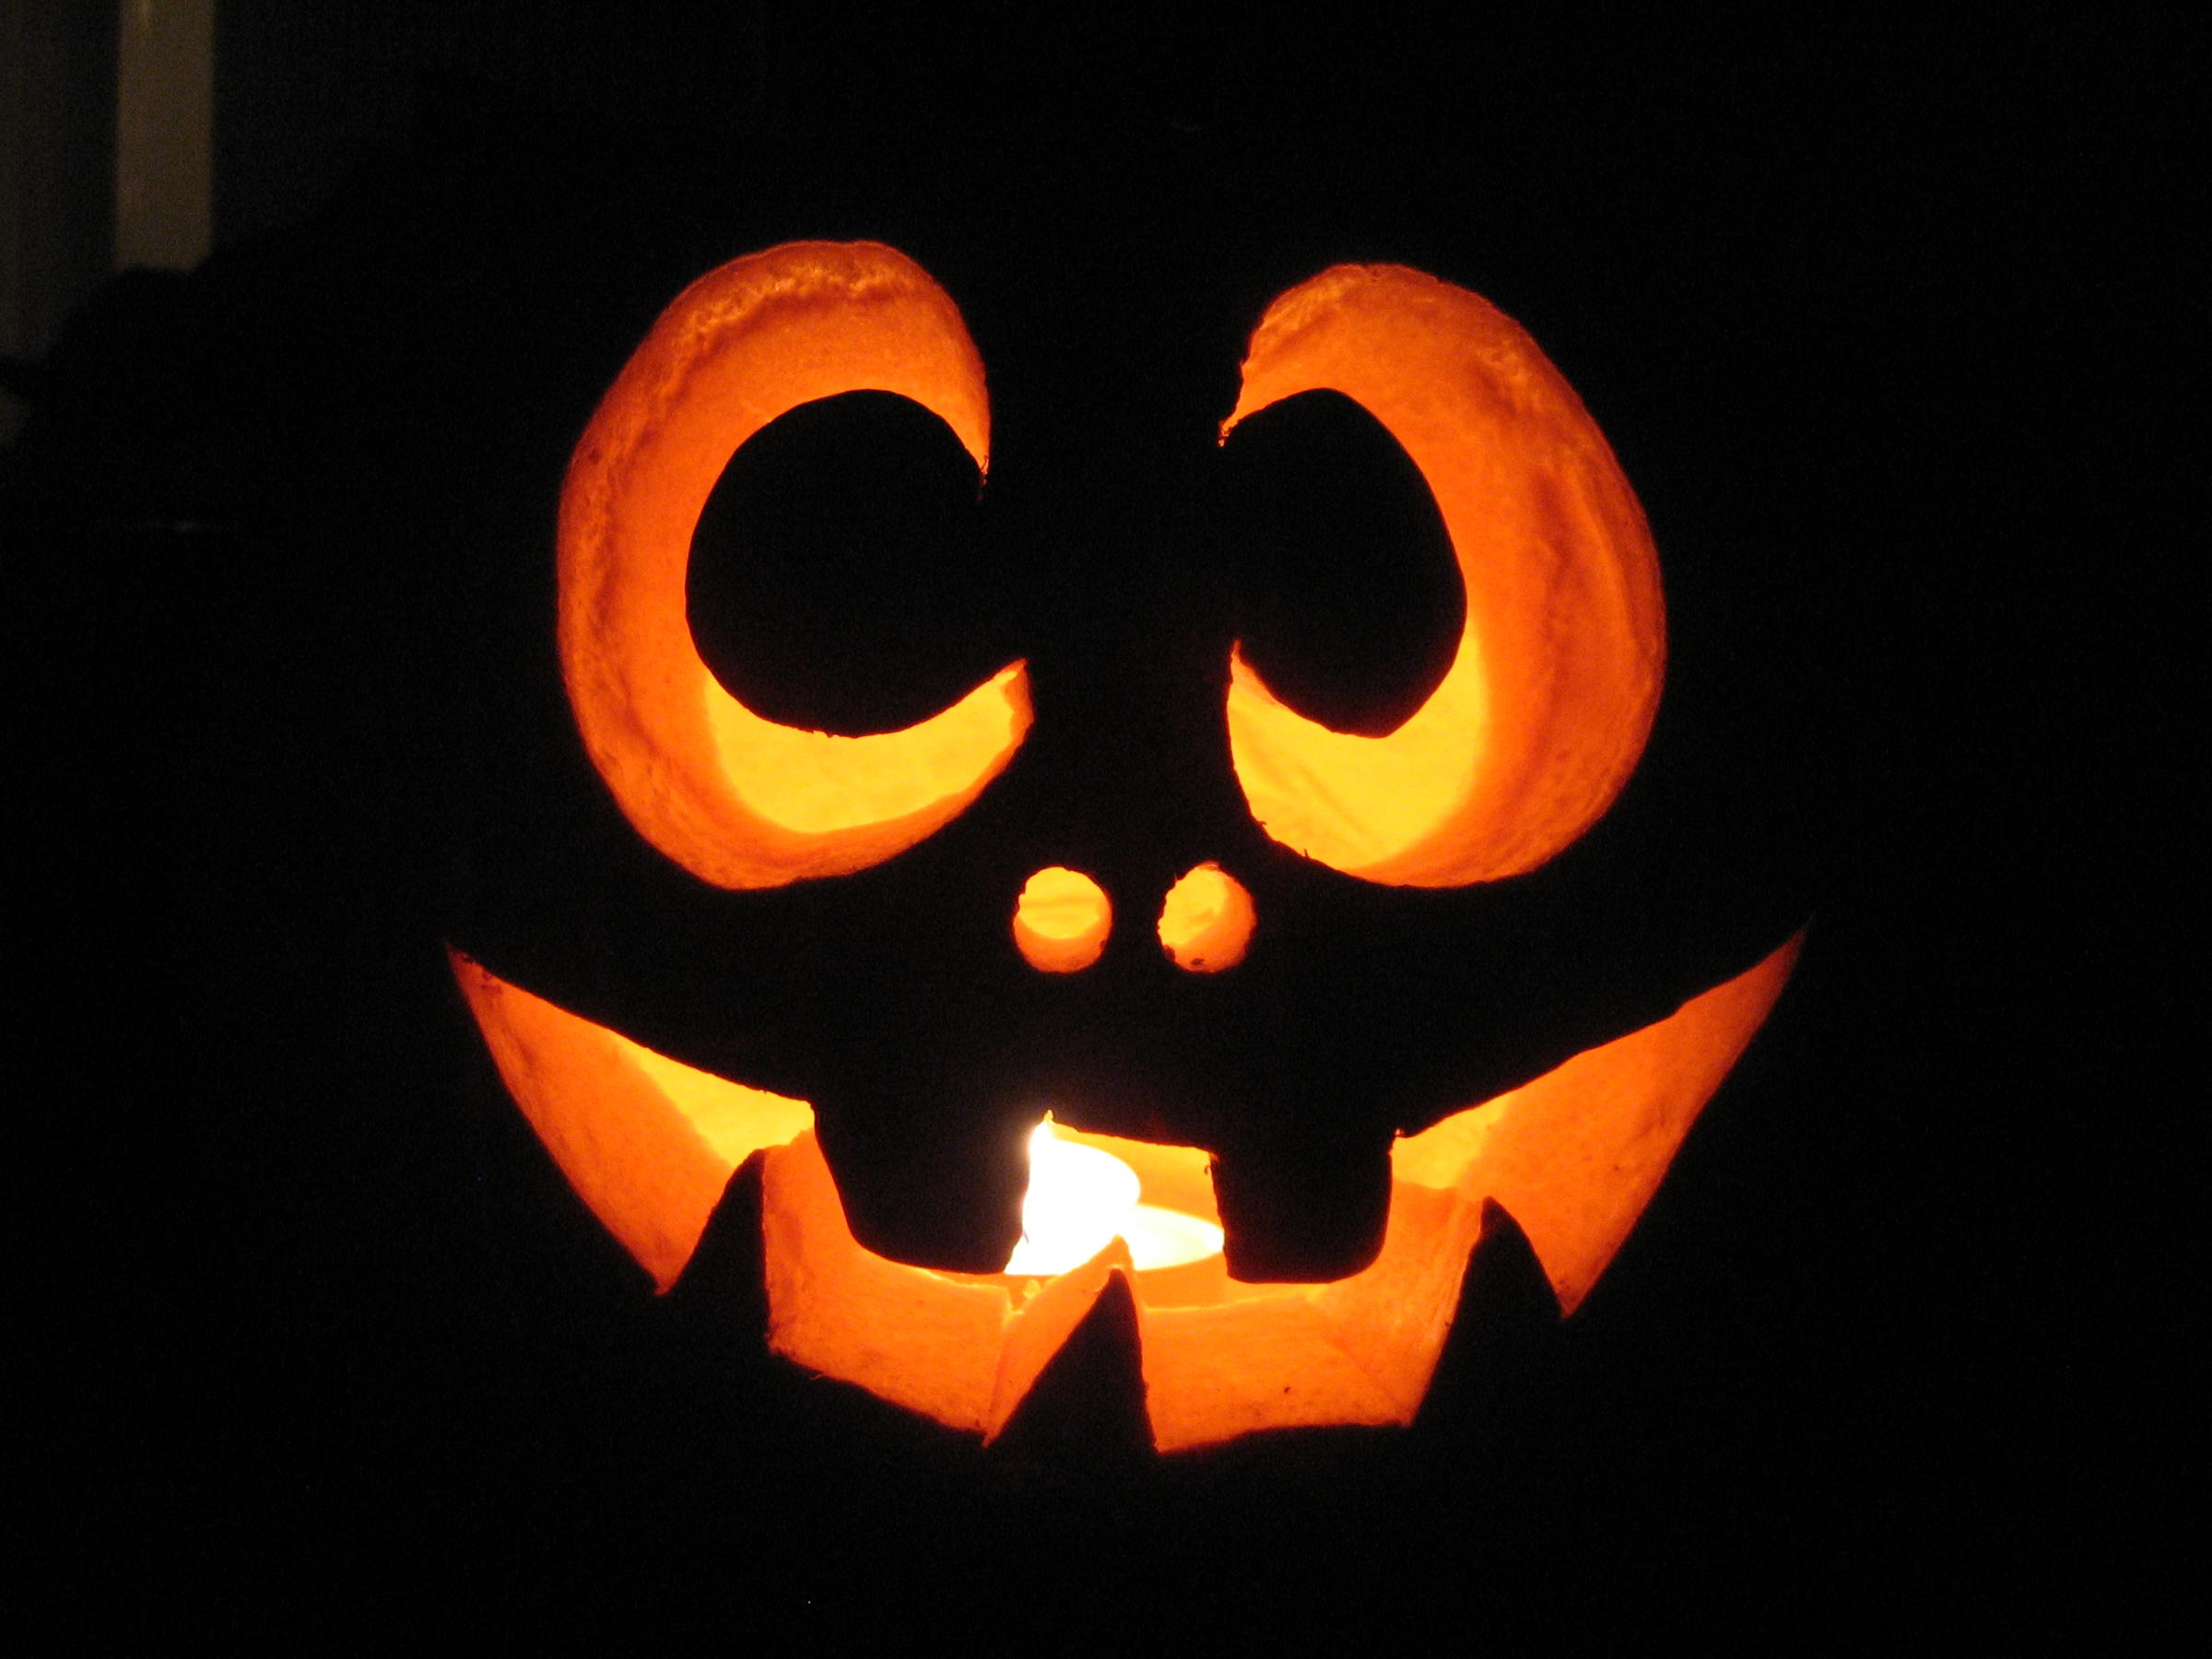 Spooky Scary Halloween Special | KUNM